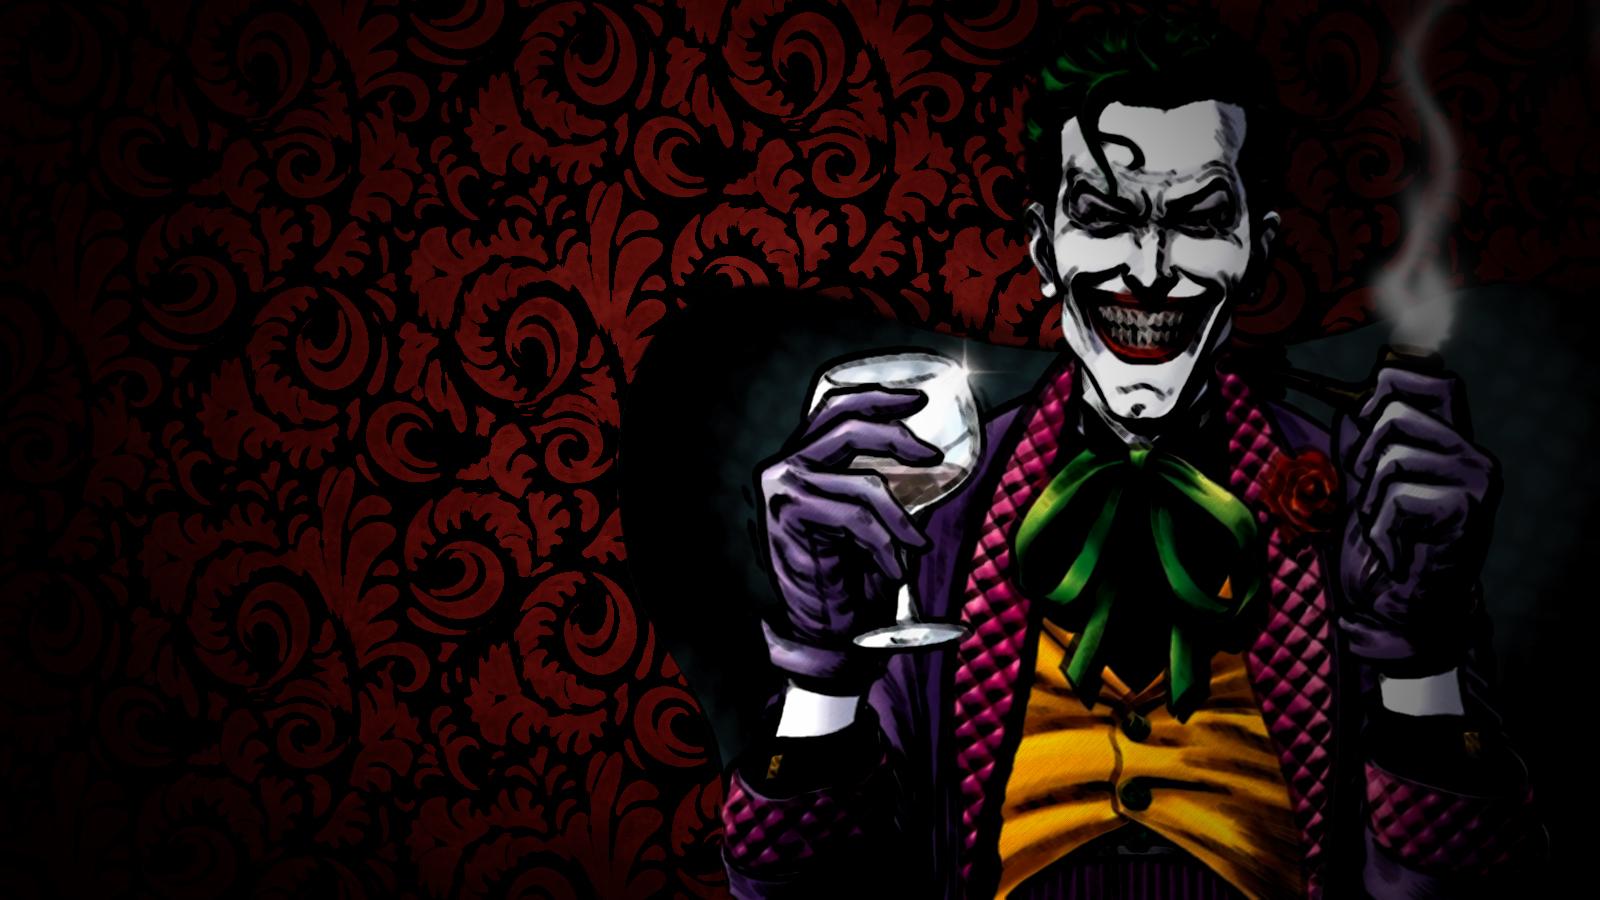 The Joker Wallpaper 1600x900 The Joker Wine 1600x900